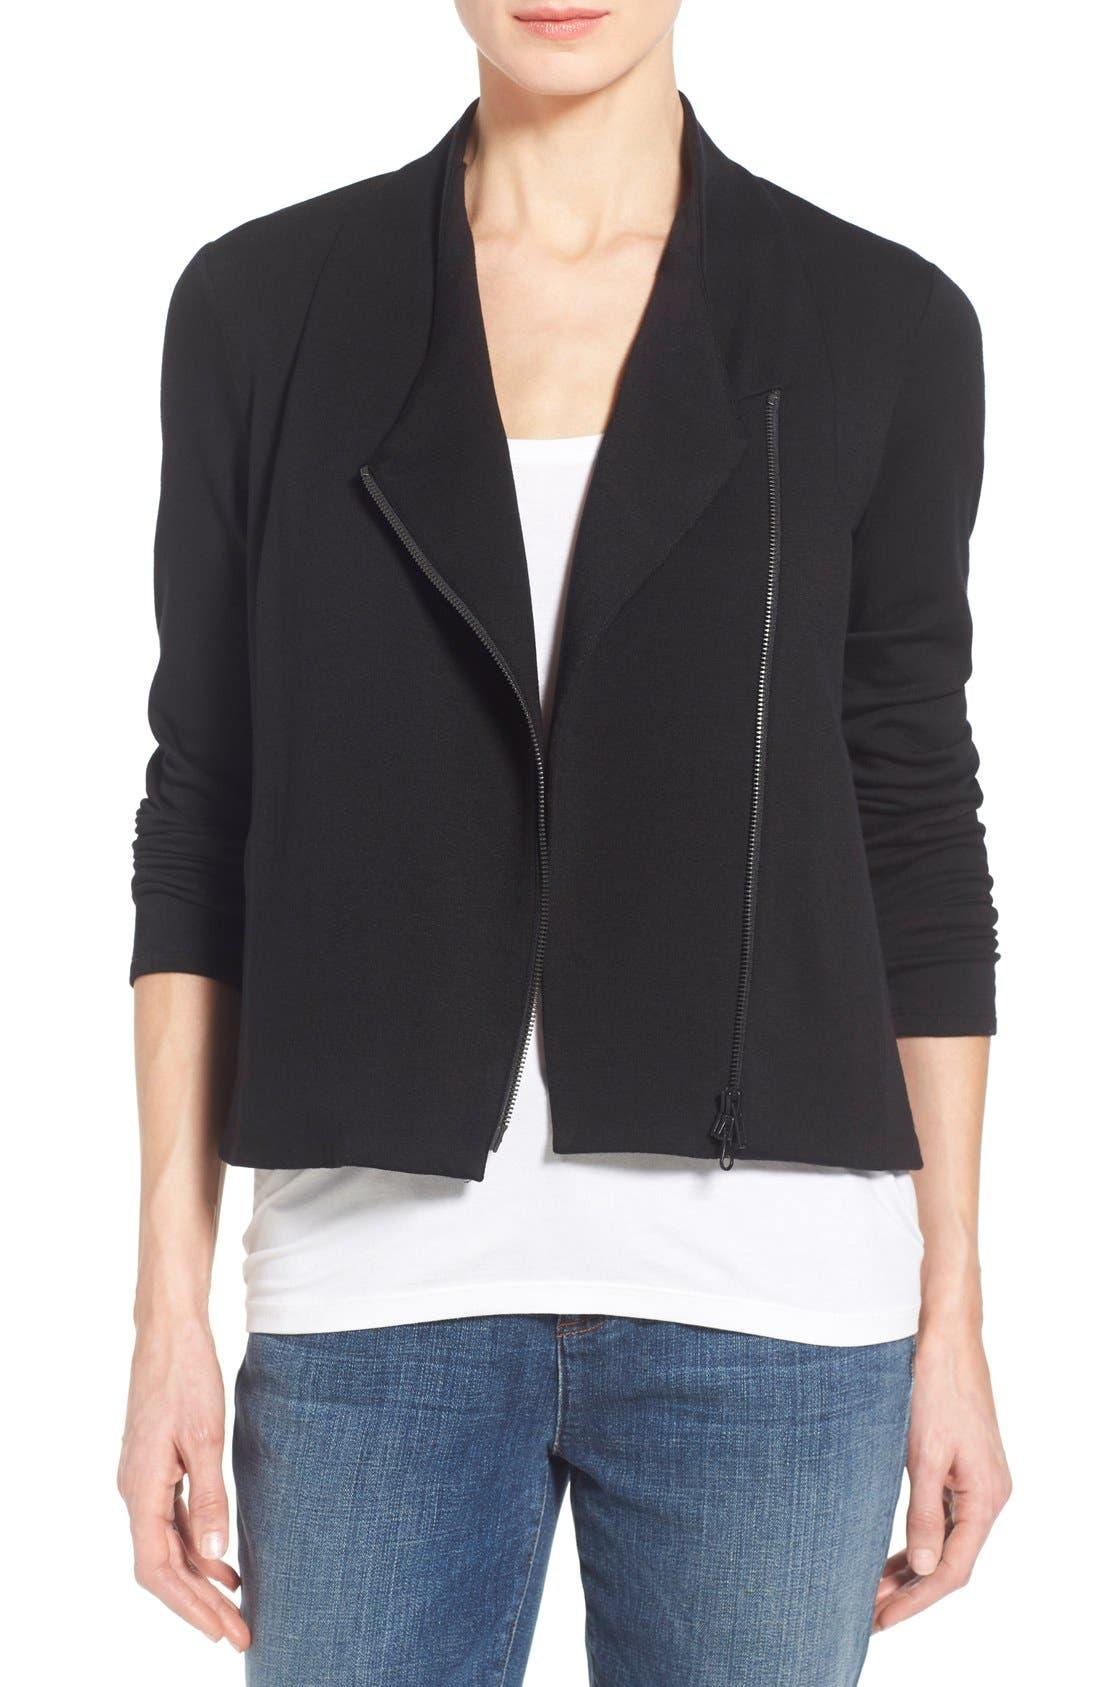 Alternate Image 1 Selected - Eileen Fisher Tencel® Jersey High Collar Jacket (Regular & Petite)